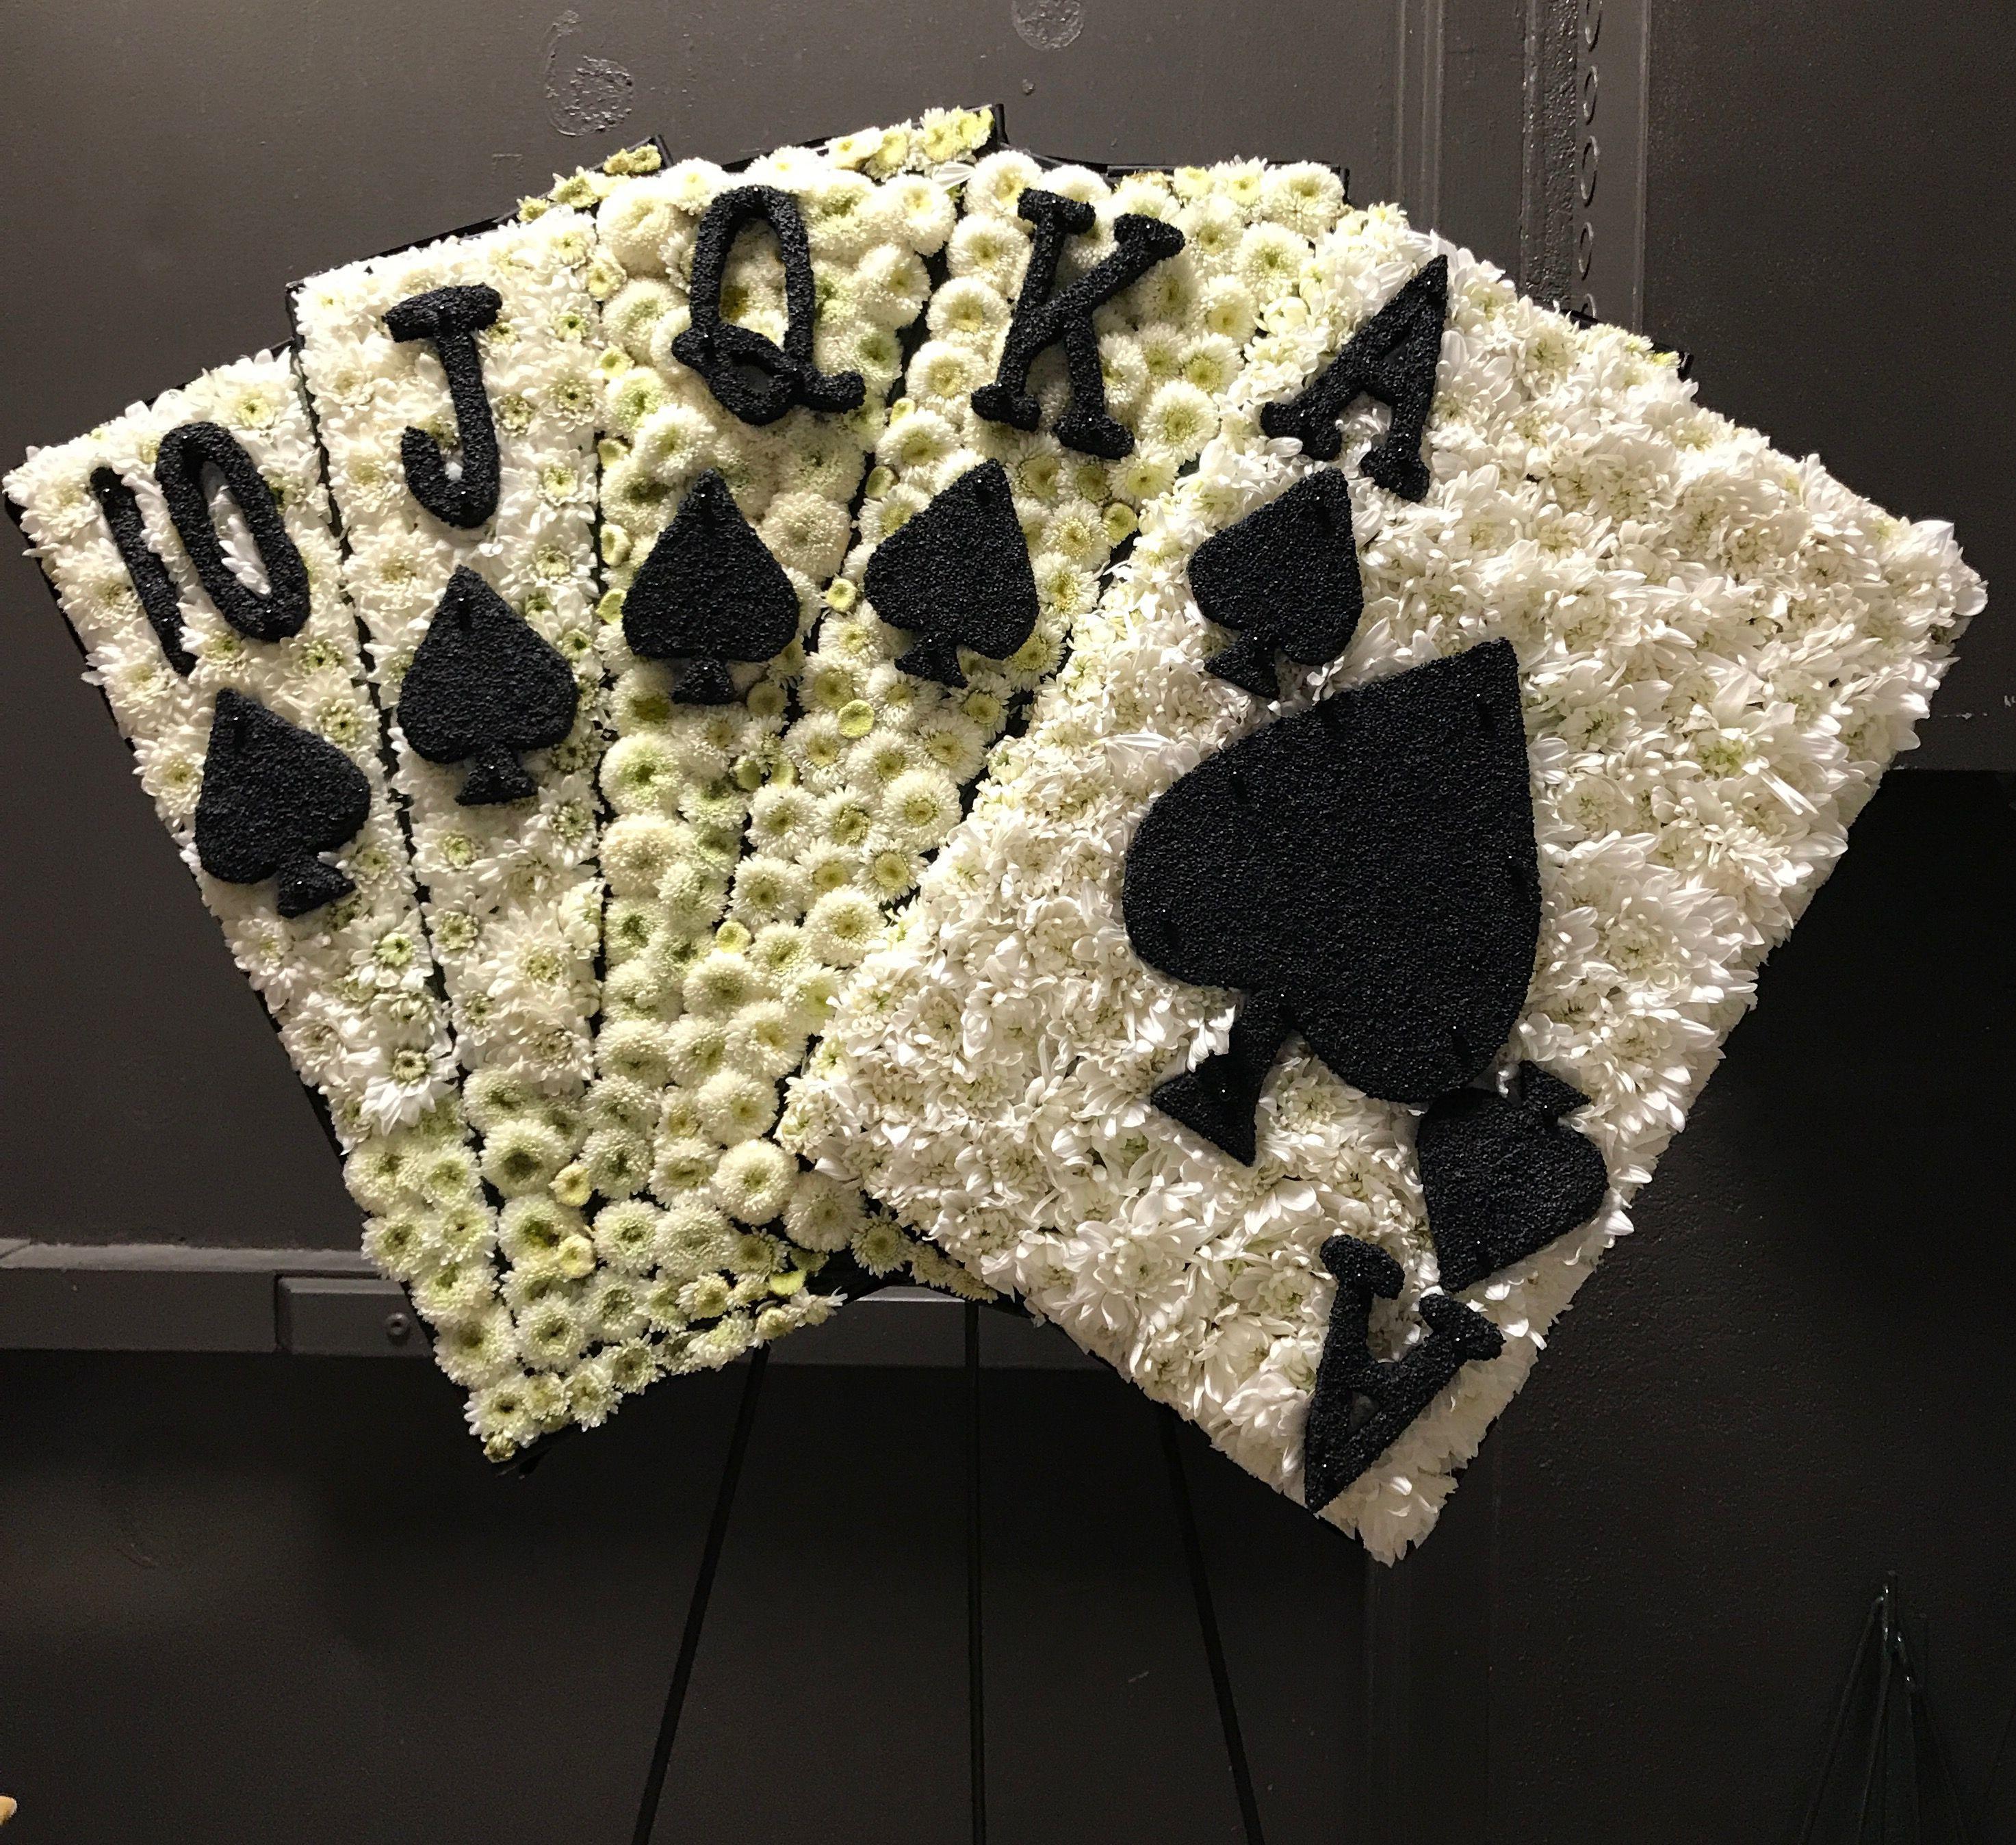 98d225f933bd35c9ed370634d5c6983d - Royal Palm Memorial Gardens Funeral Home